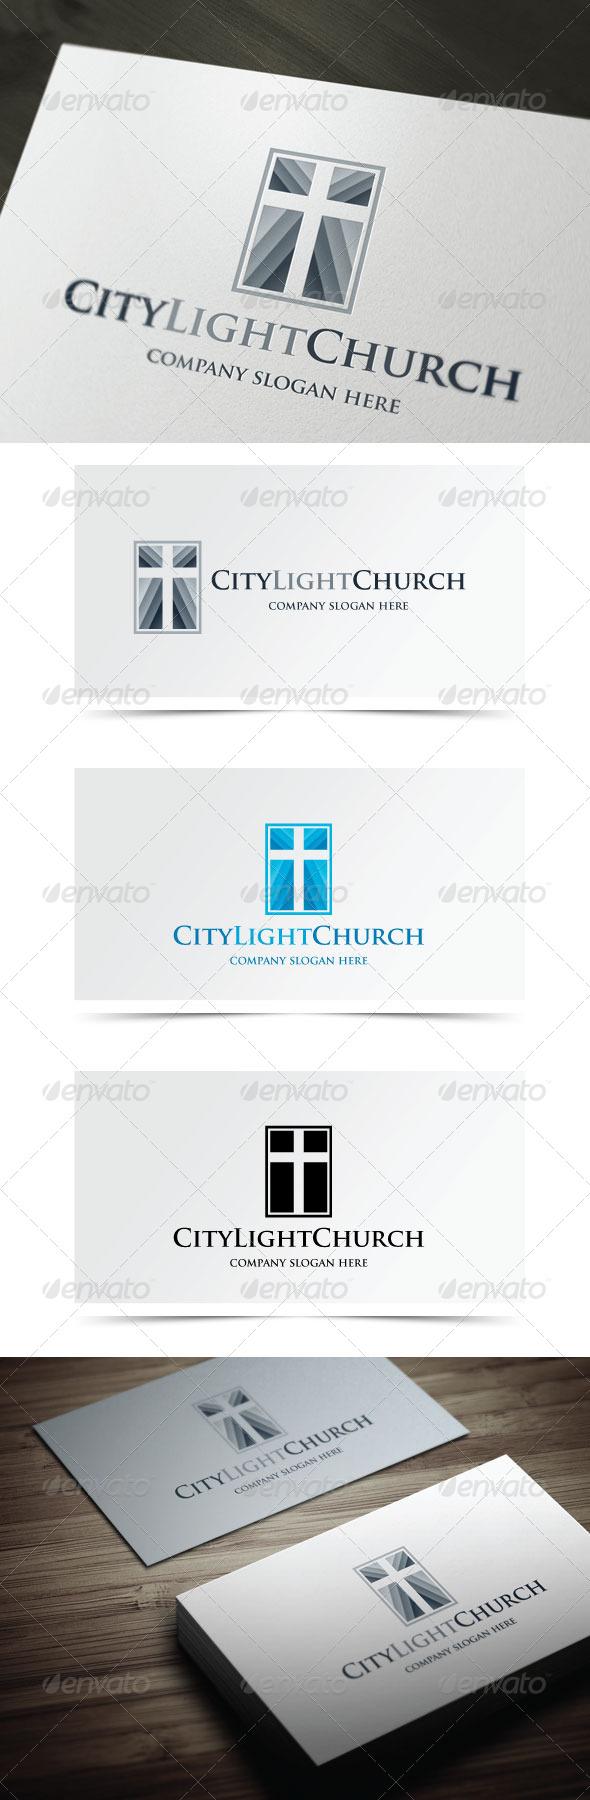 GraphicRiver City Light Church 5524061